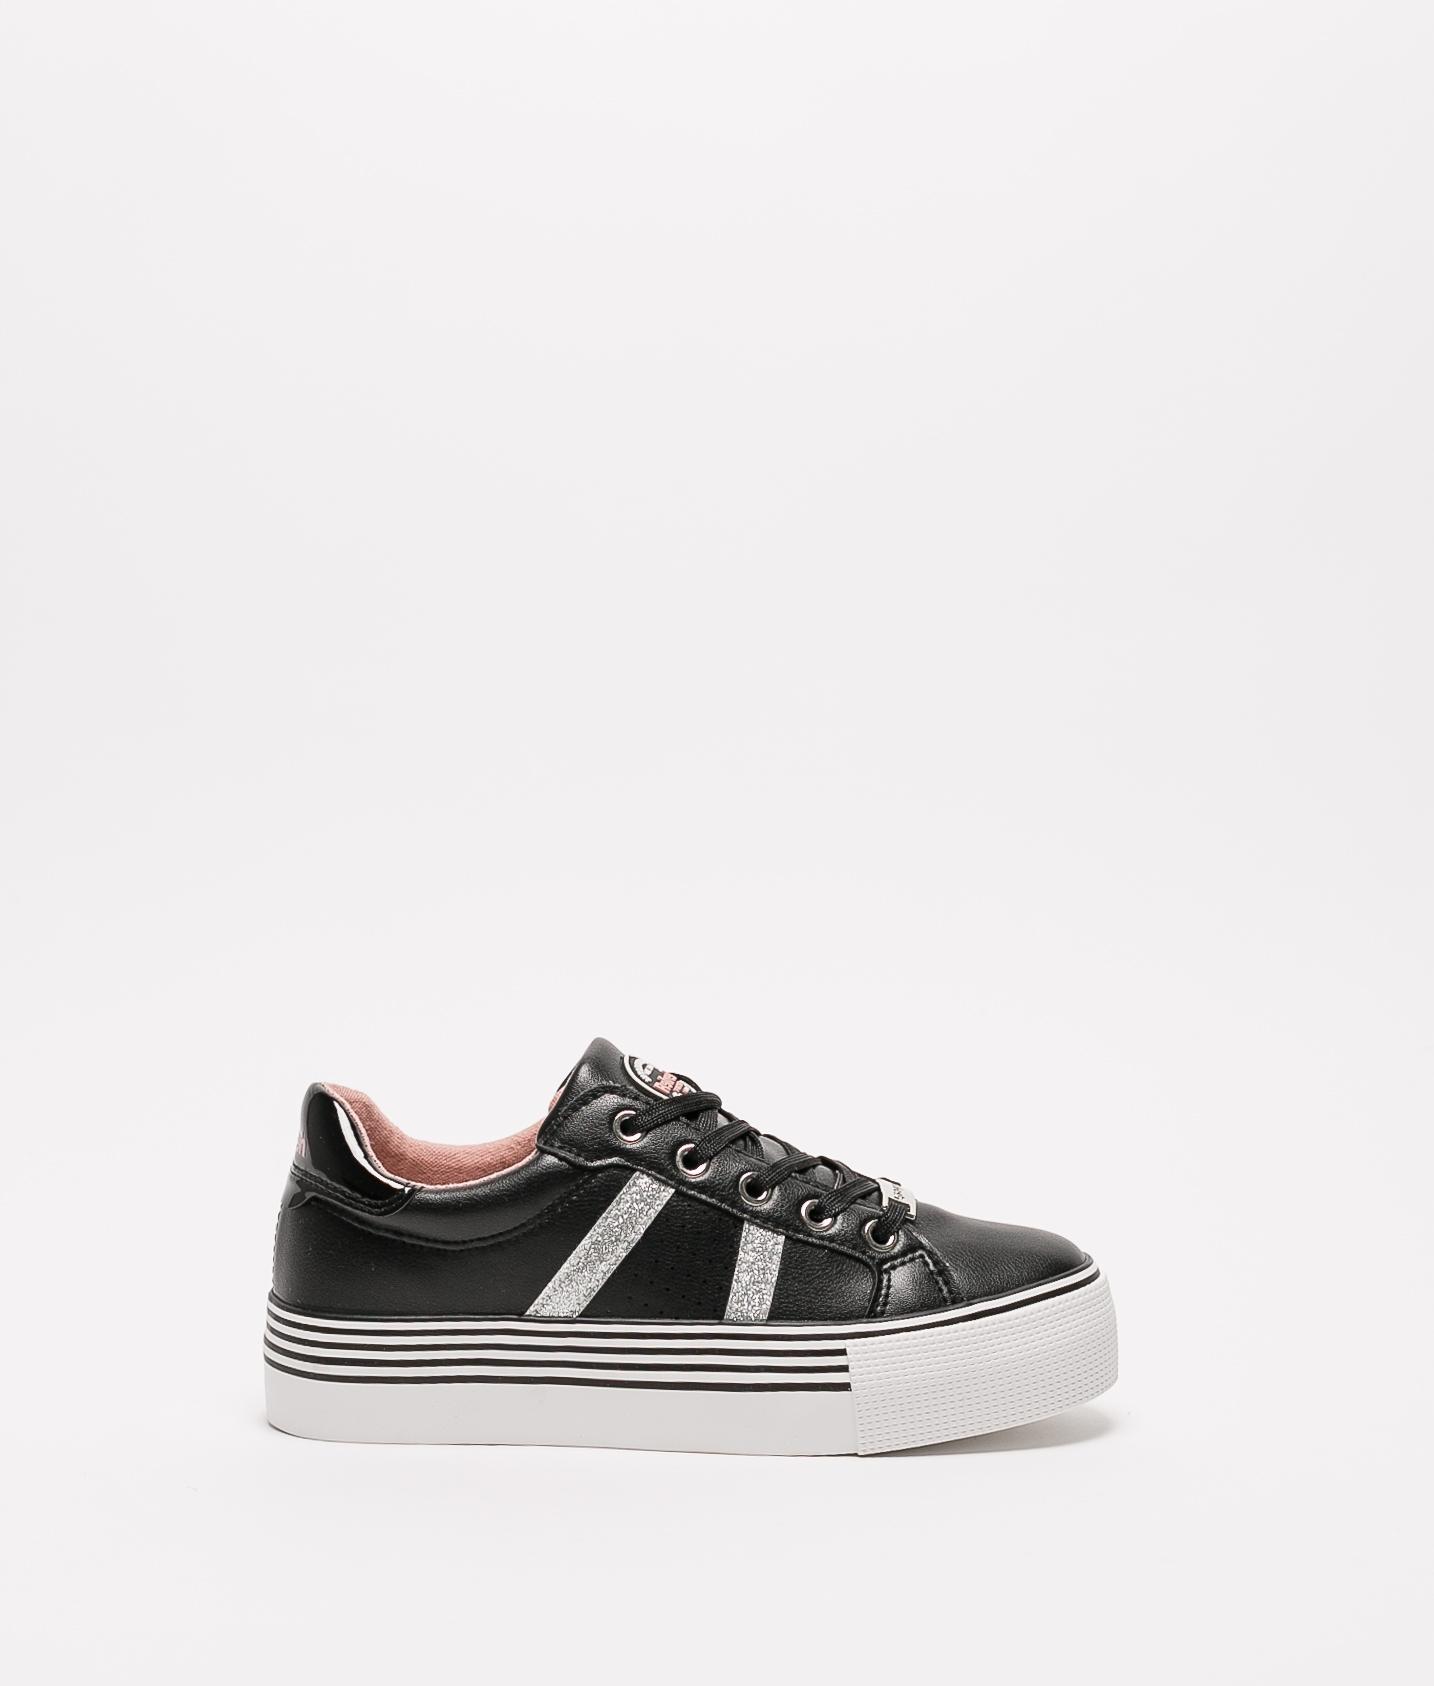 Sneakers Brilo Refresh - Black